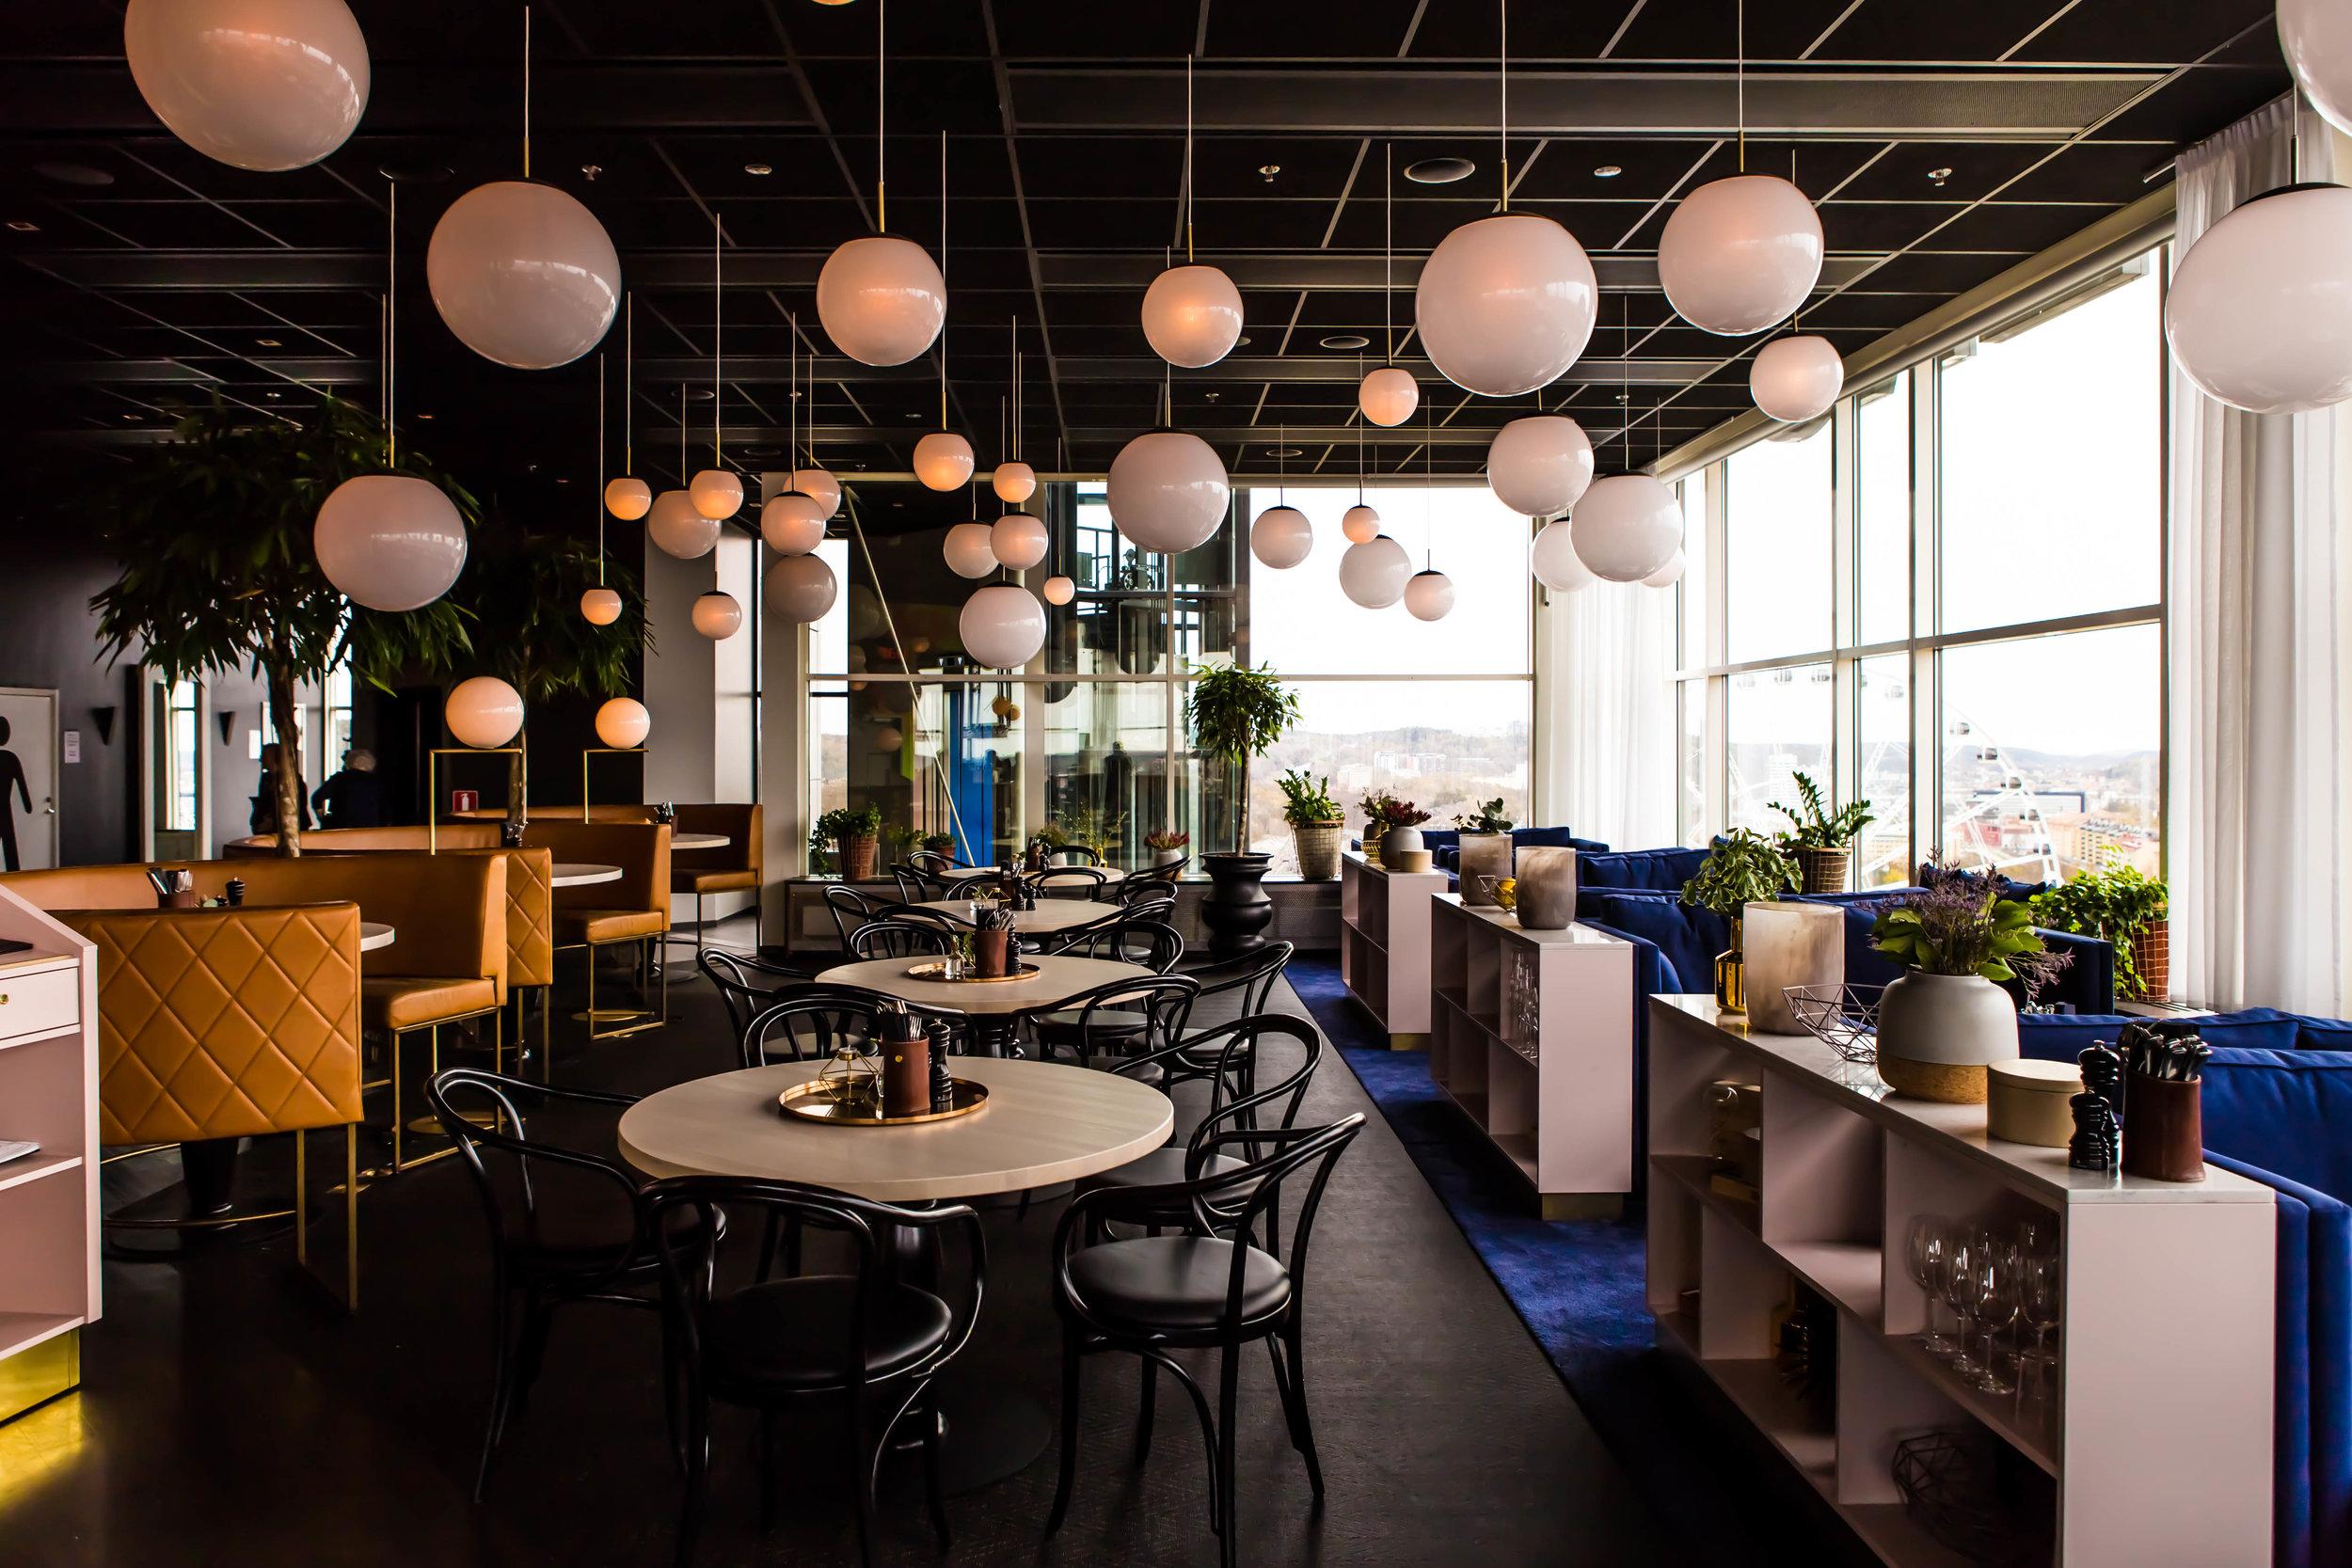 Sofa-restaurant-Heaven23-Gothenburg-Sweden-Facctory-photographer-Julio-Chang-3.jpg